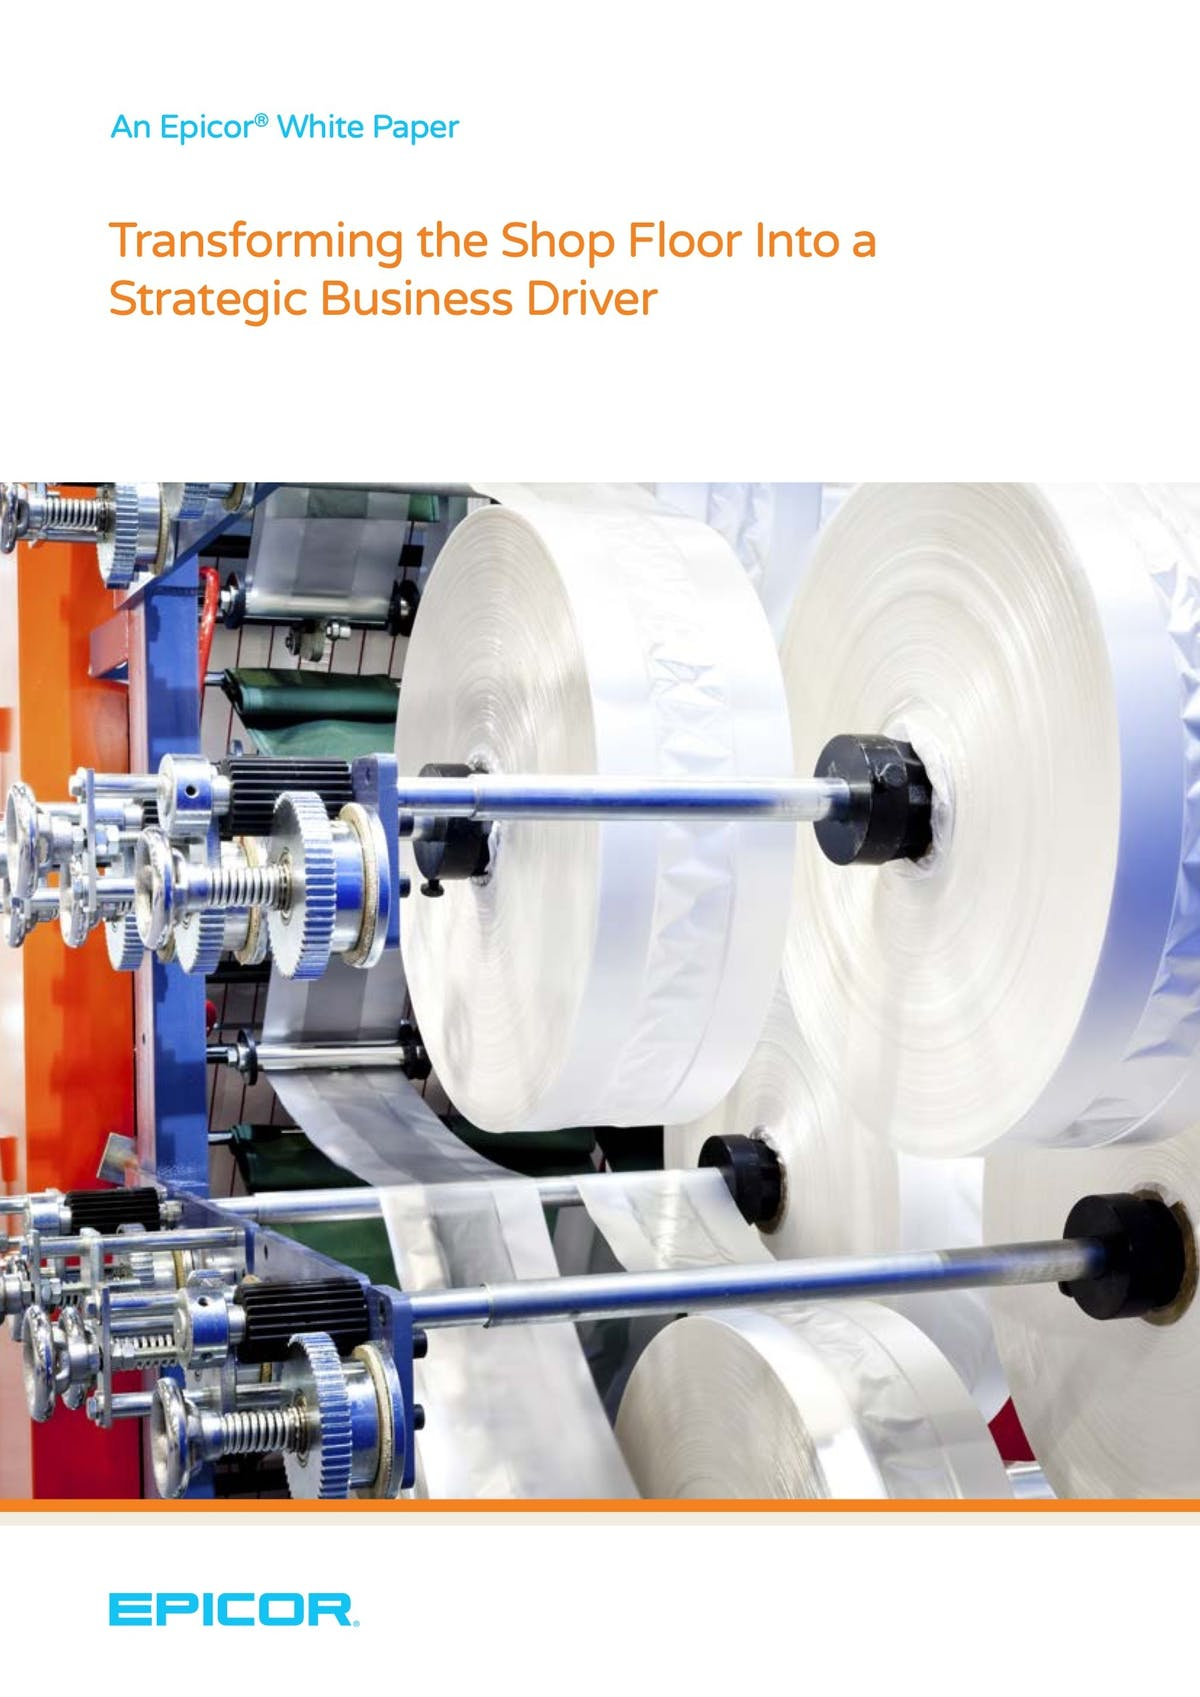 Epicor Mattec (Advanced MES) White Paper - Transforming the Shop Floor into a Strategic Business Driver